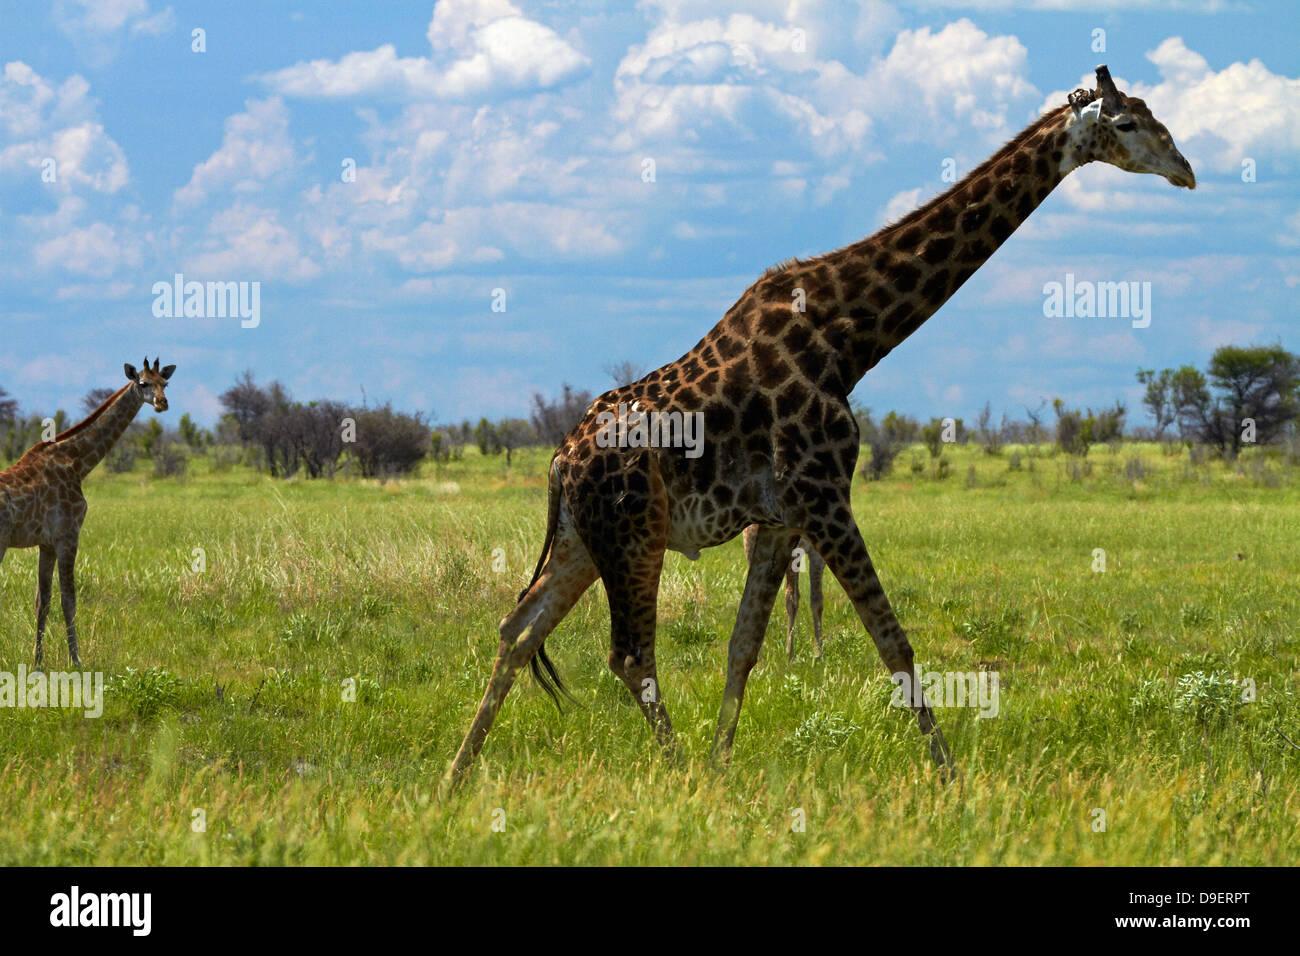 Giraffe (Giraffa camelopardalis angolensis), Nxai Pan National Park, Botswana, Africa Immagini Stock